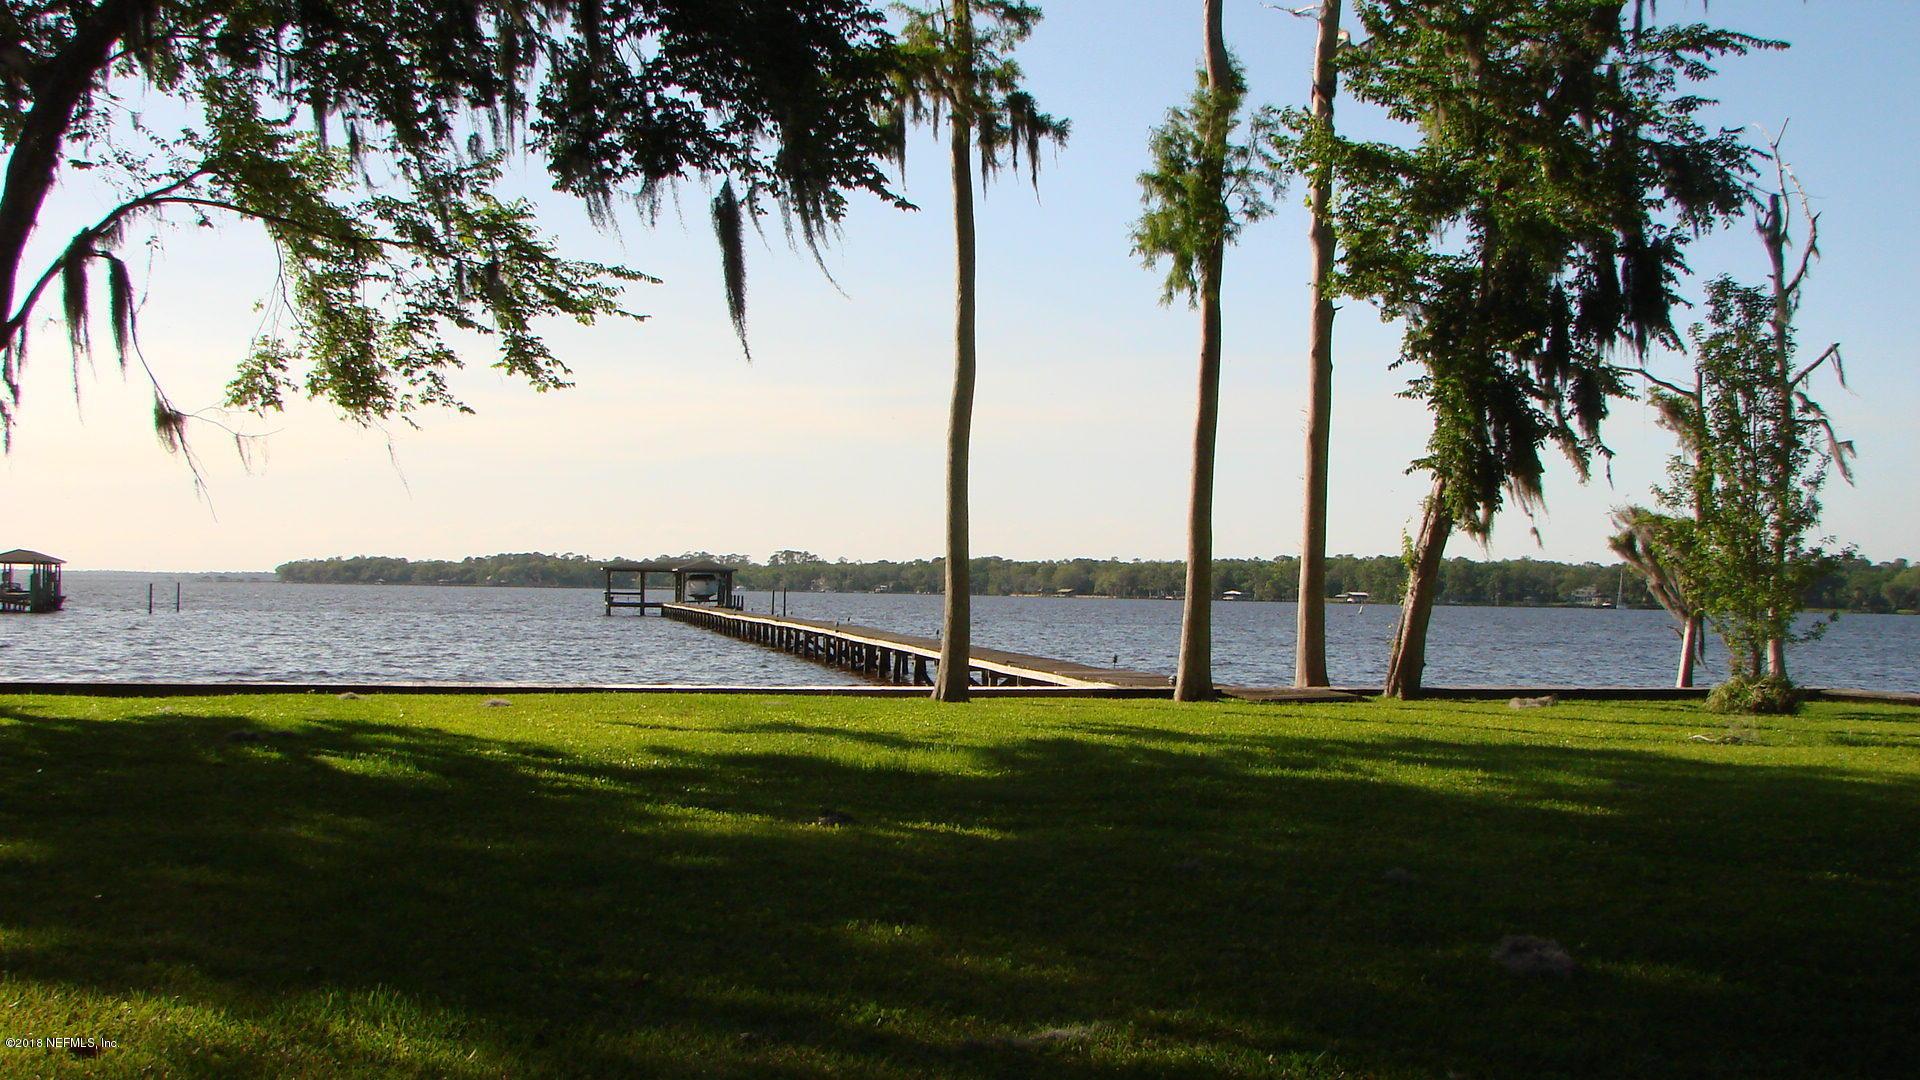 1135 POPOLEE, ST JOHNS, FLORIDA 32259, 3 Bedrooms Bedrooms, ,2 BathroomsBathrooms,Residential - single family,For sale,POPOLEE,932120